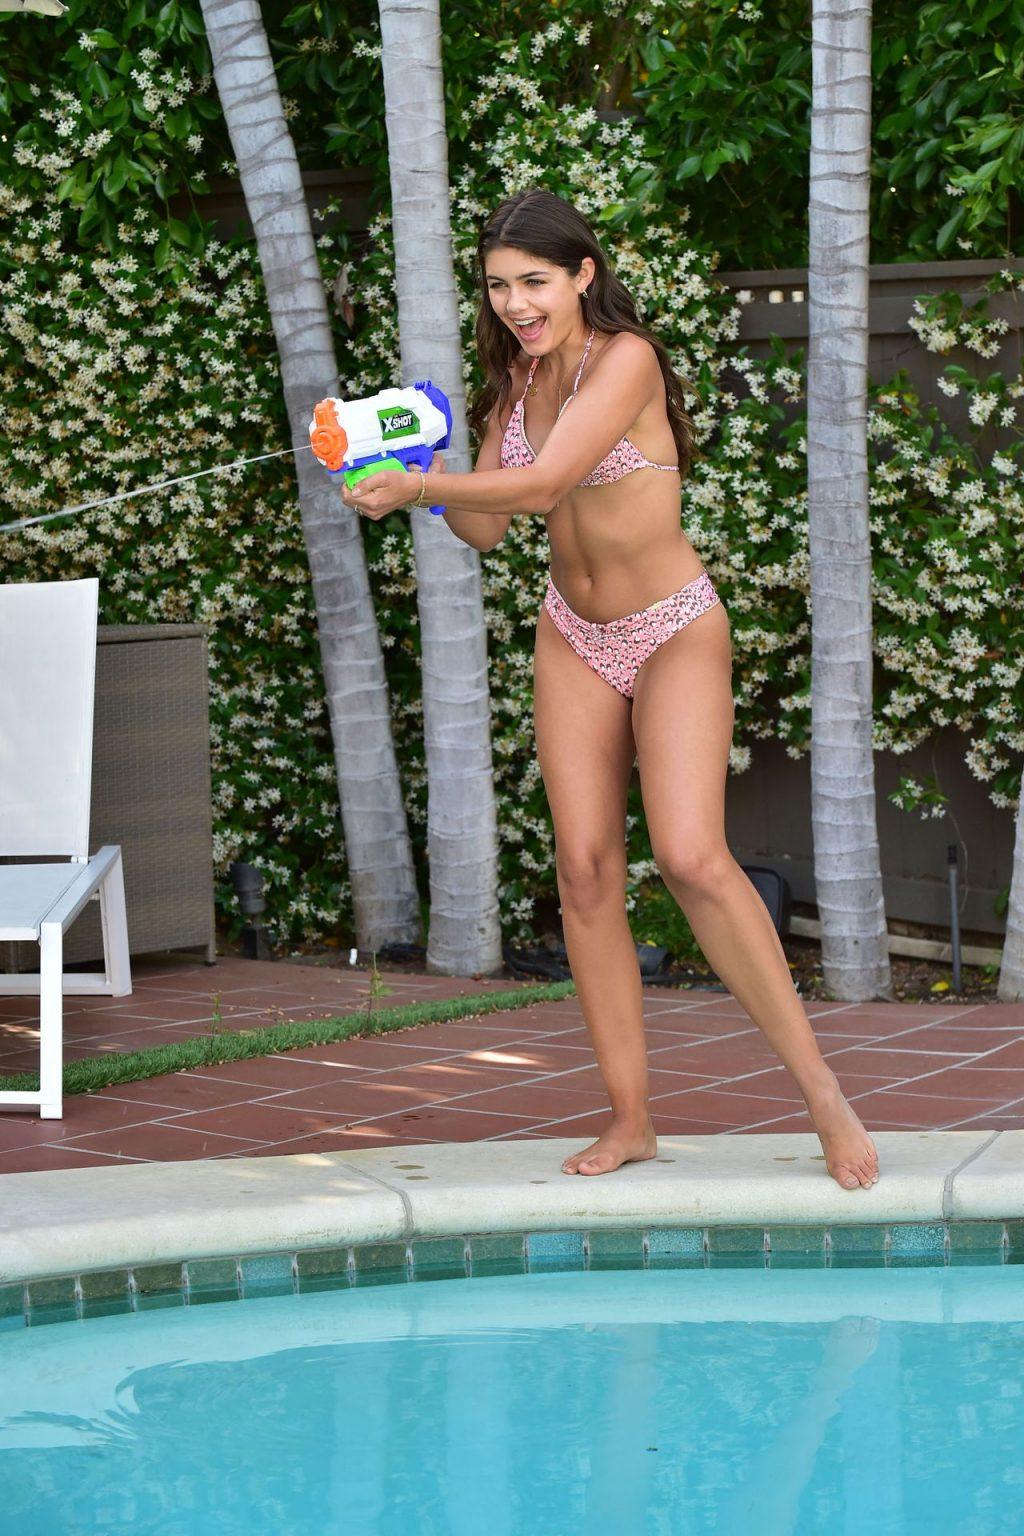 Hannah Ann Sluss Looks Great in a Bikini (13 Photos)